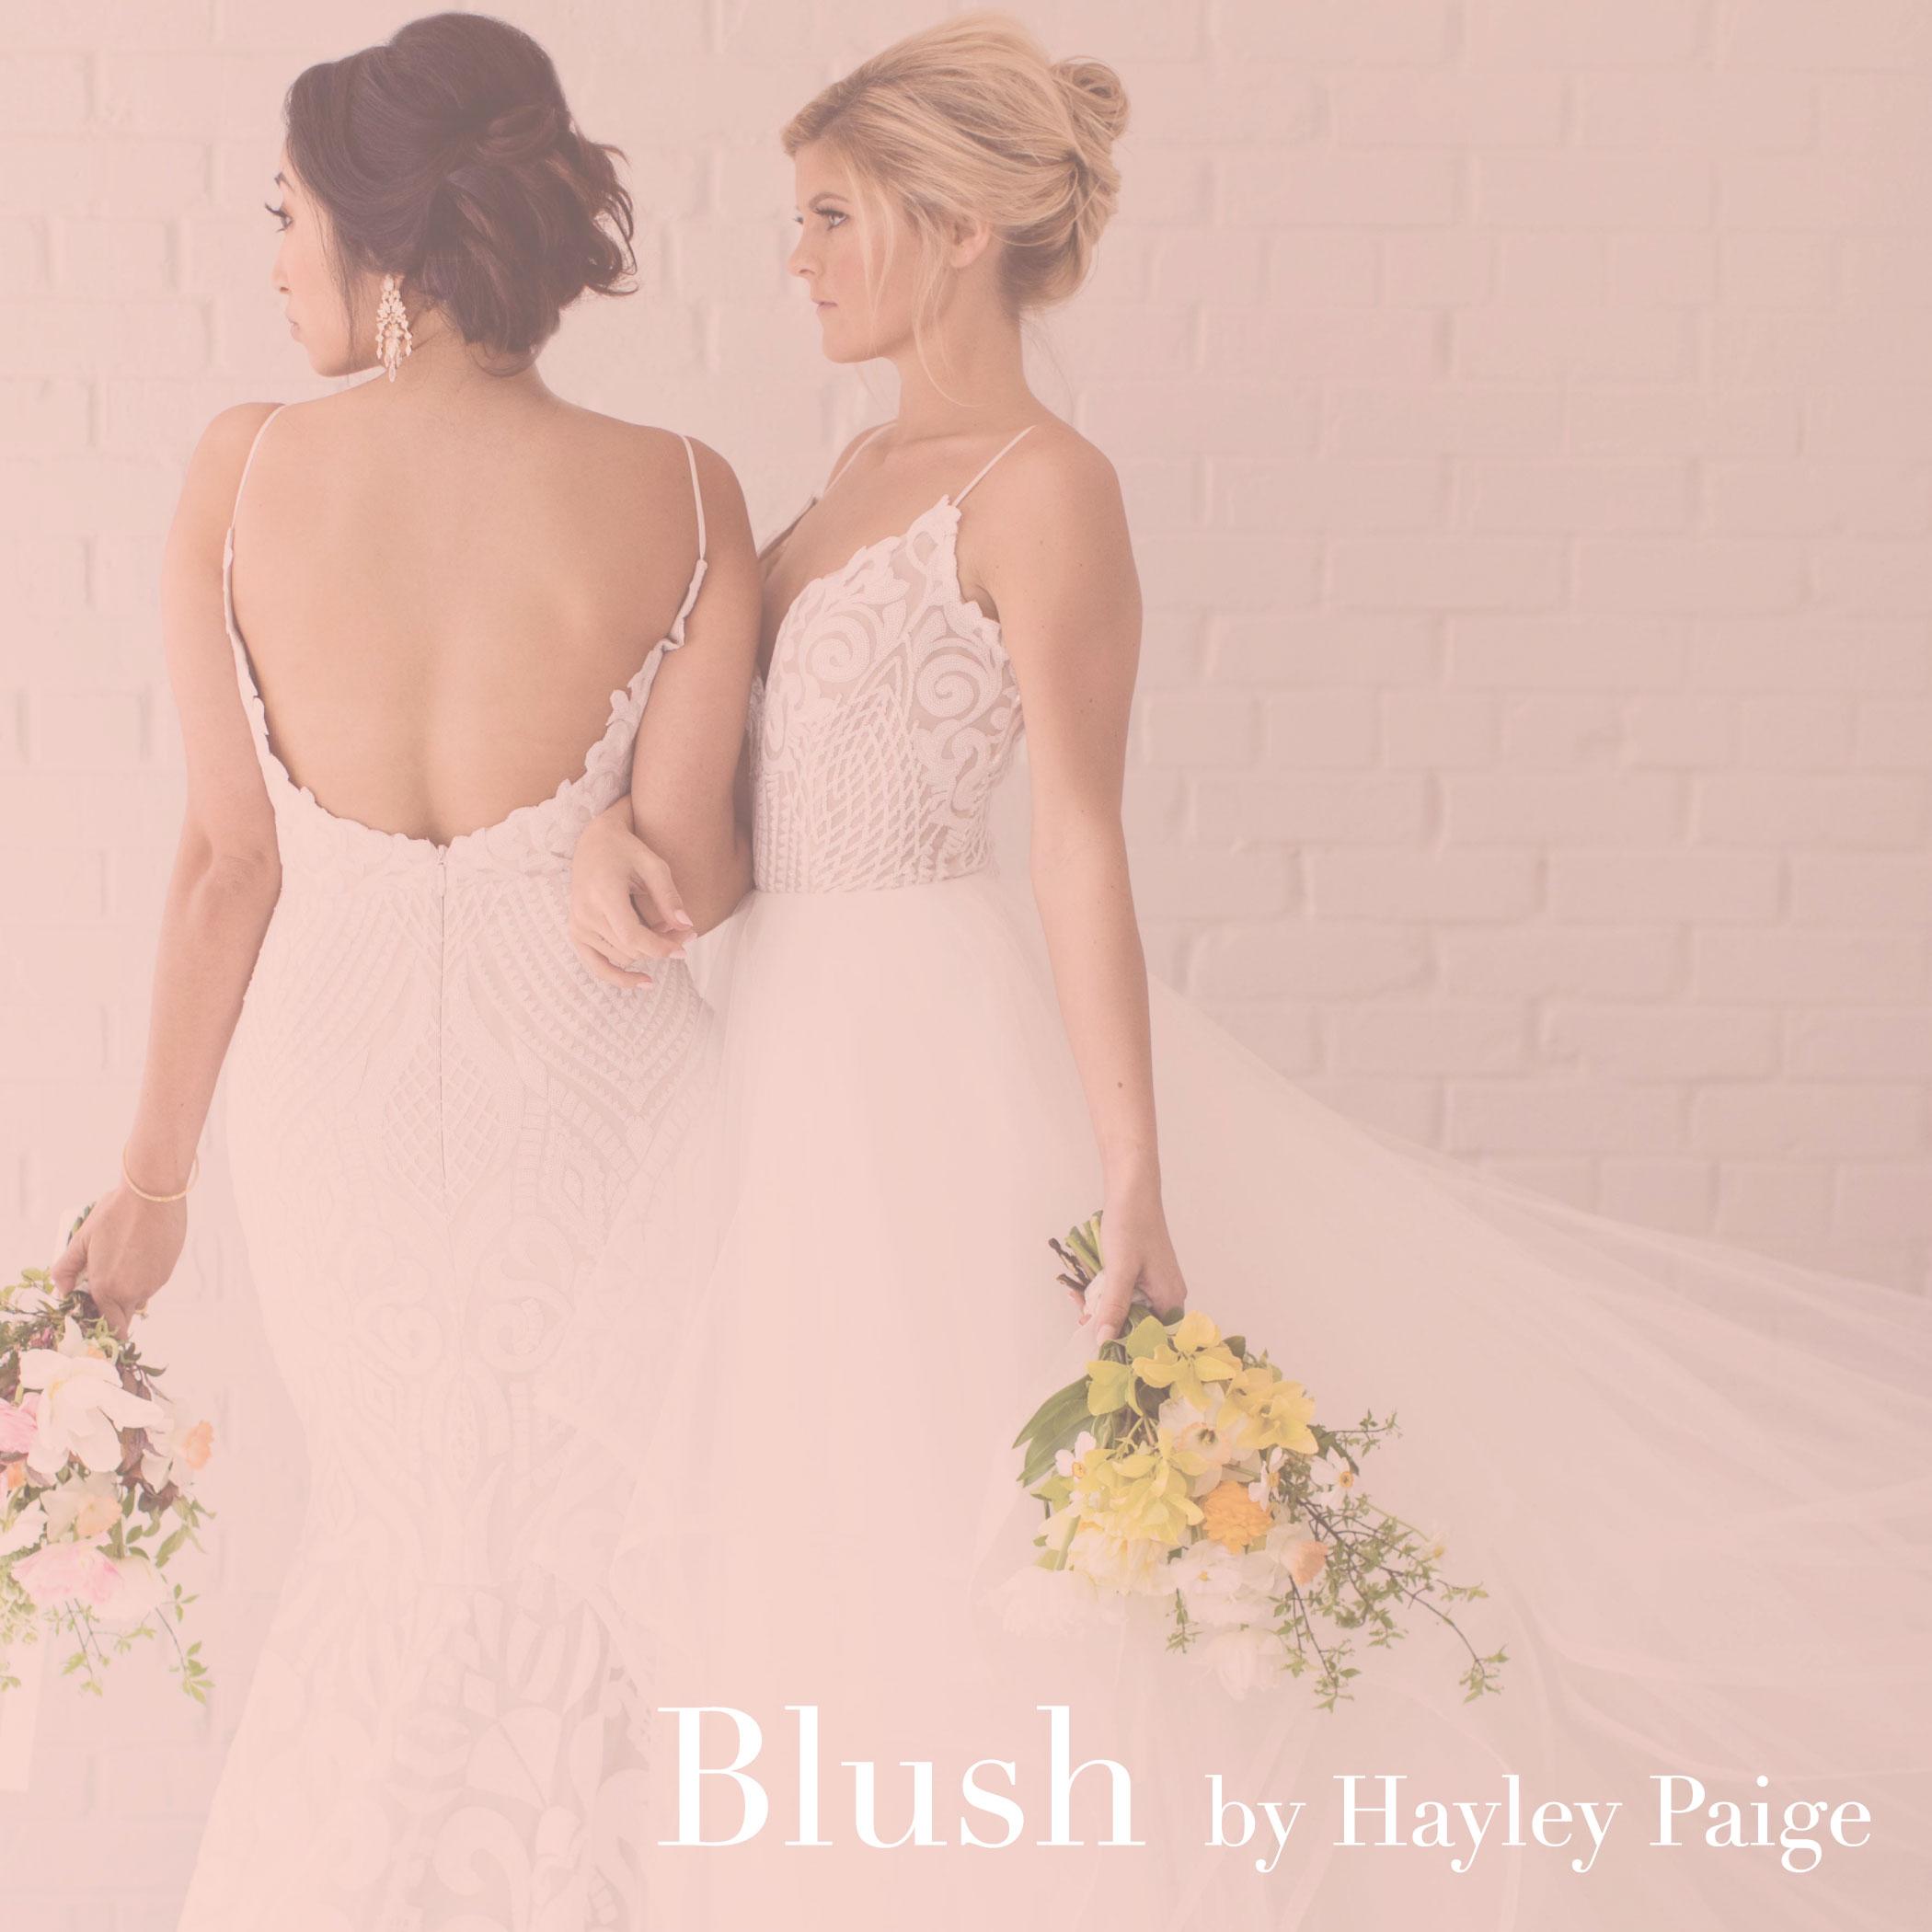 Blush by Hayley Paige.jpg